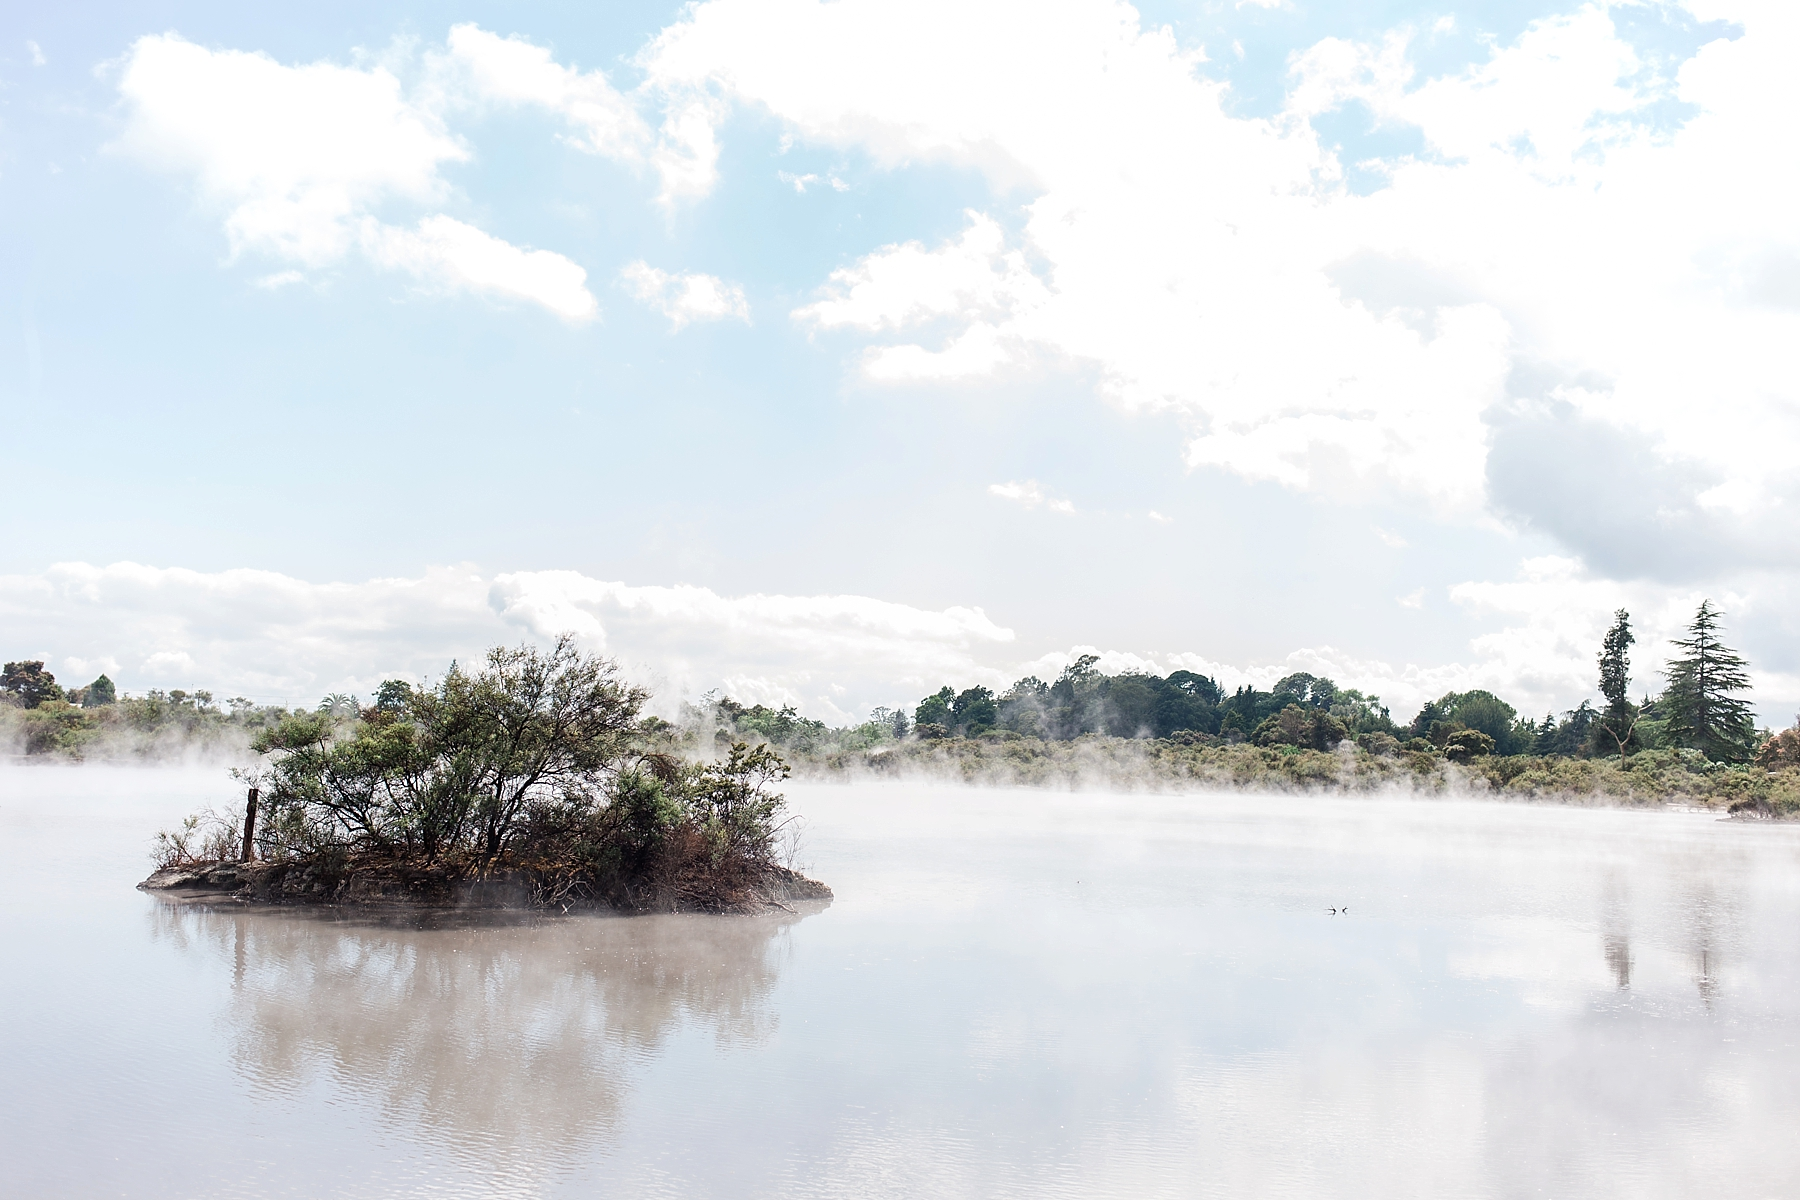 north-island-rotorua-new-zealand-scenery_0211.jpg